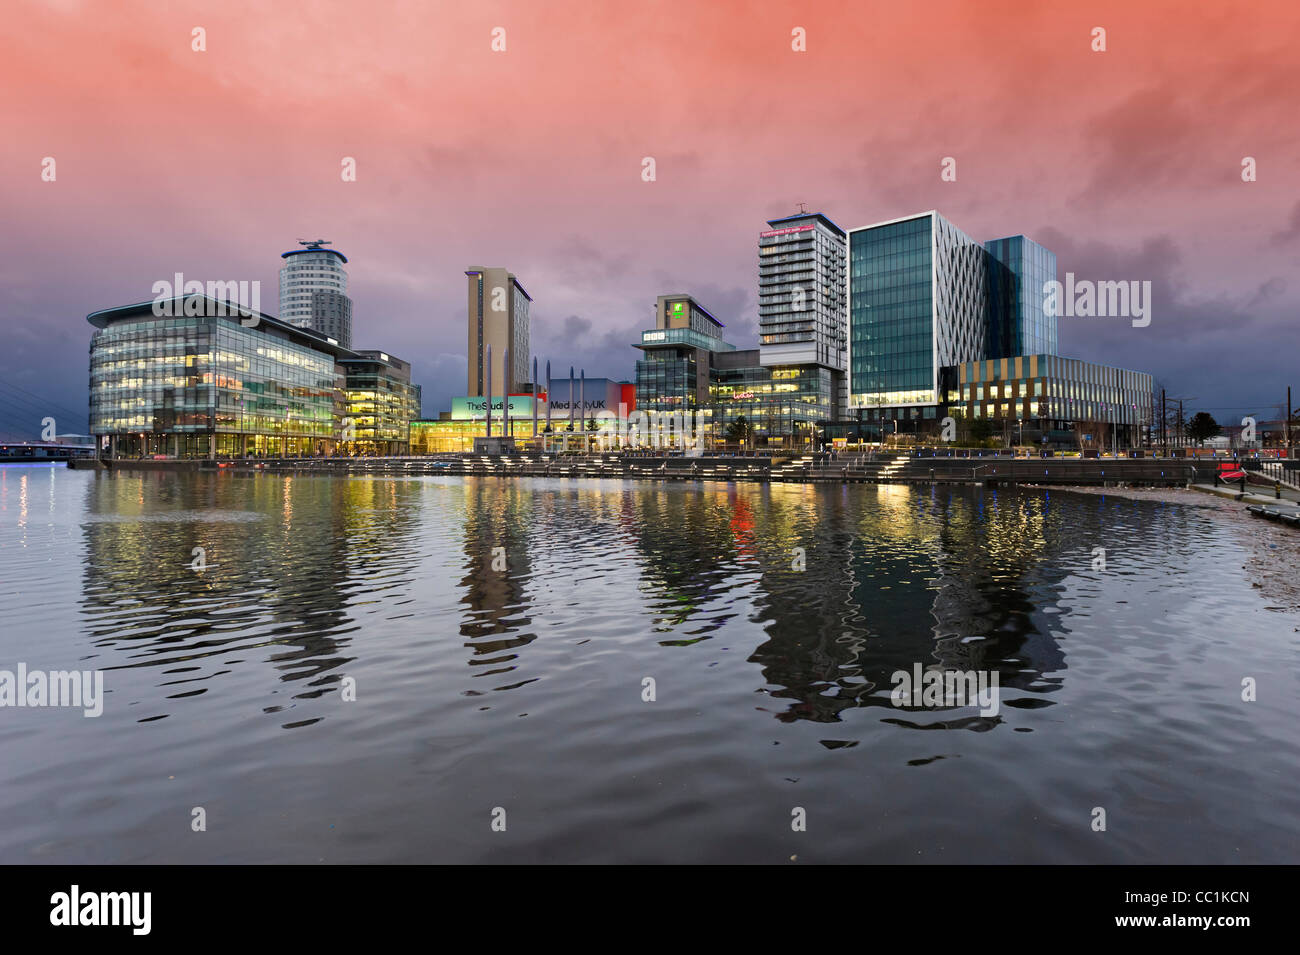 MediaCityUK, Salford Quays, Manchester, UK - Stock Image